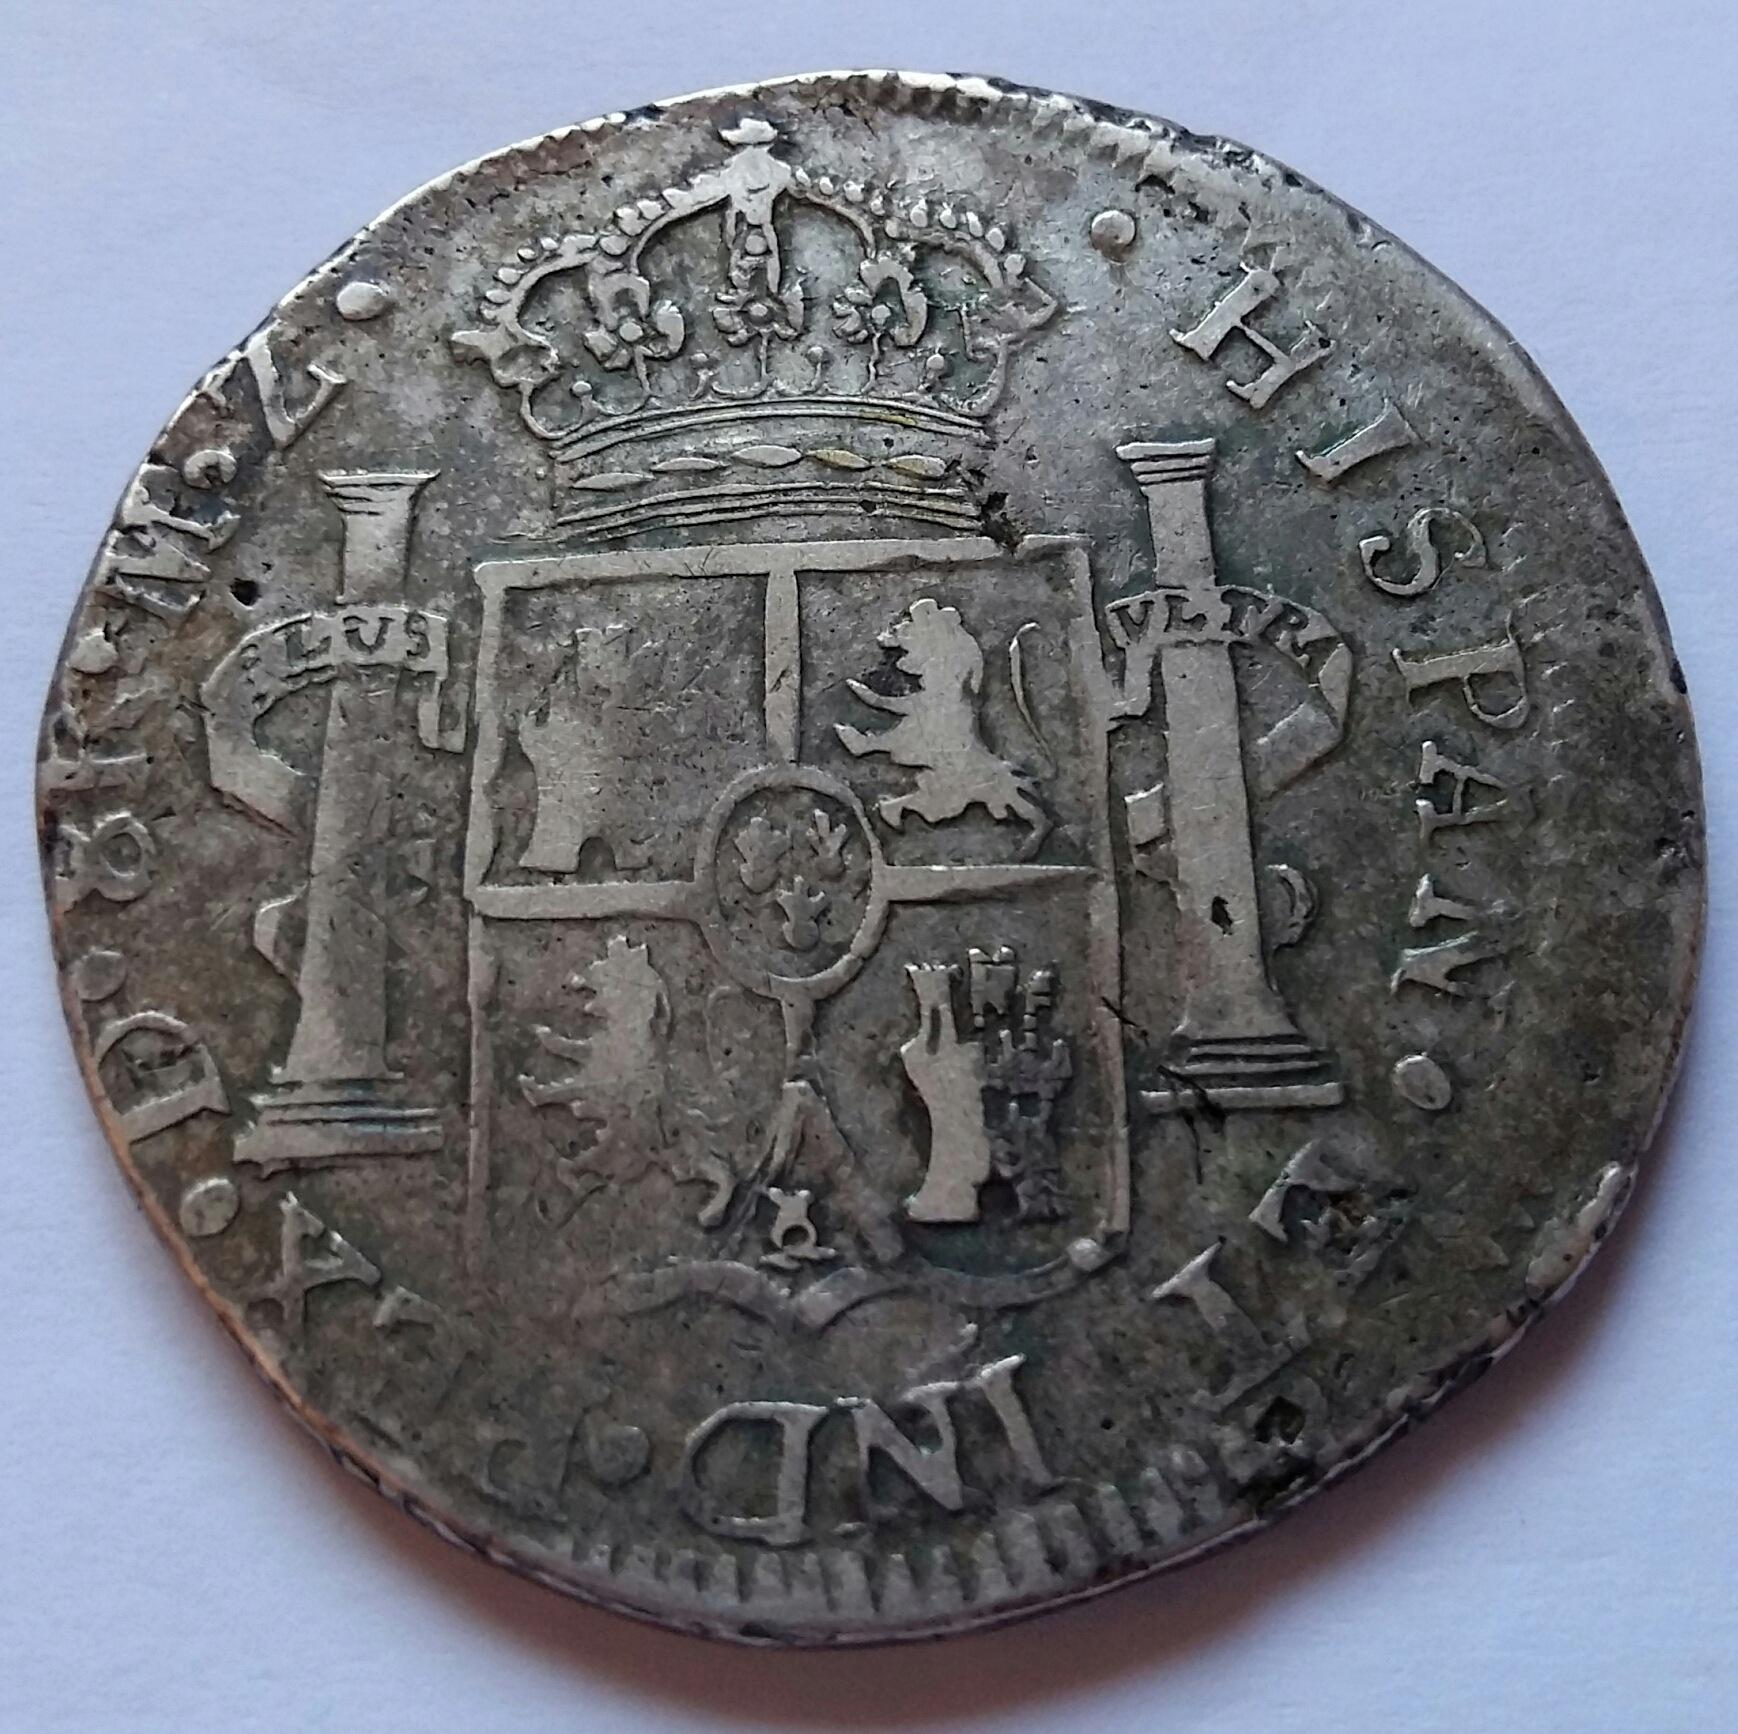 8 Reales 1816. Fernando VII. Durango MZ 8_real15